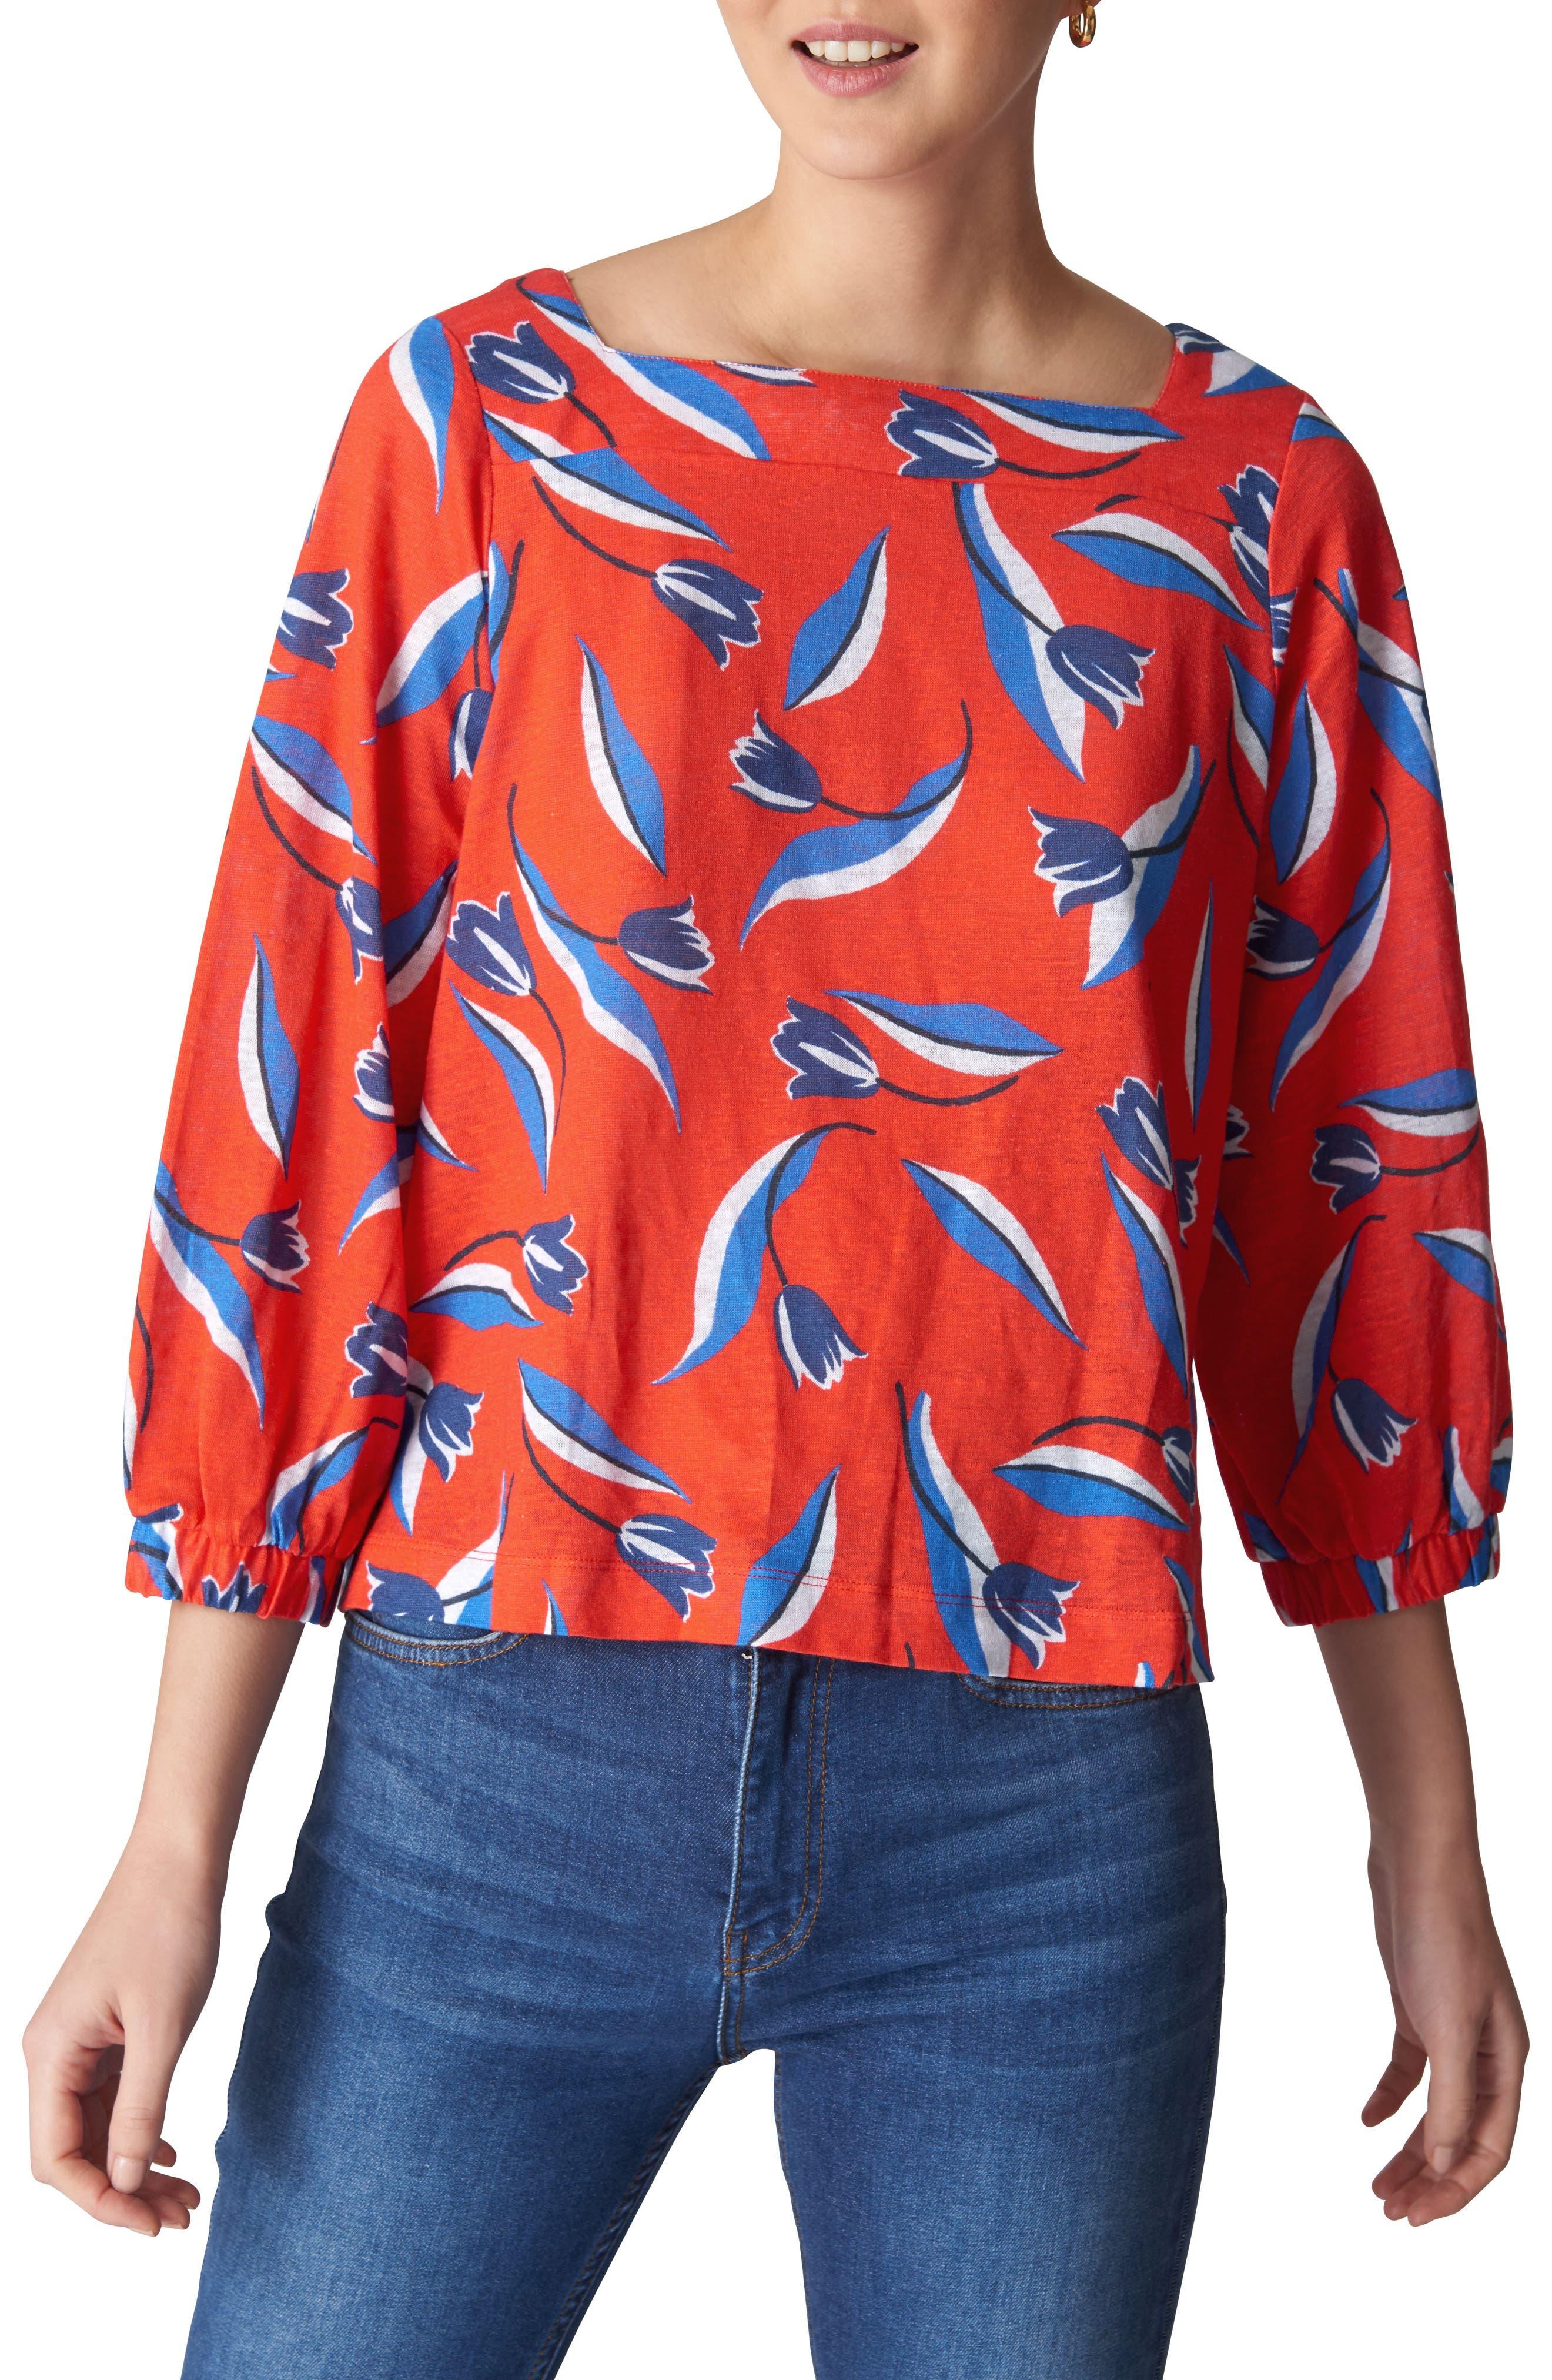 Tulip Print Linen Top,                         Main,                         color, Red/ Multi